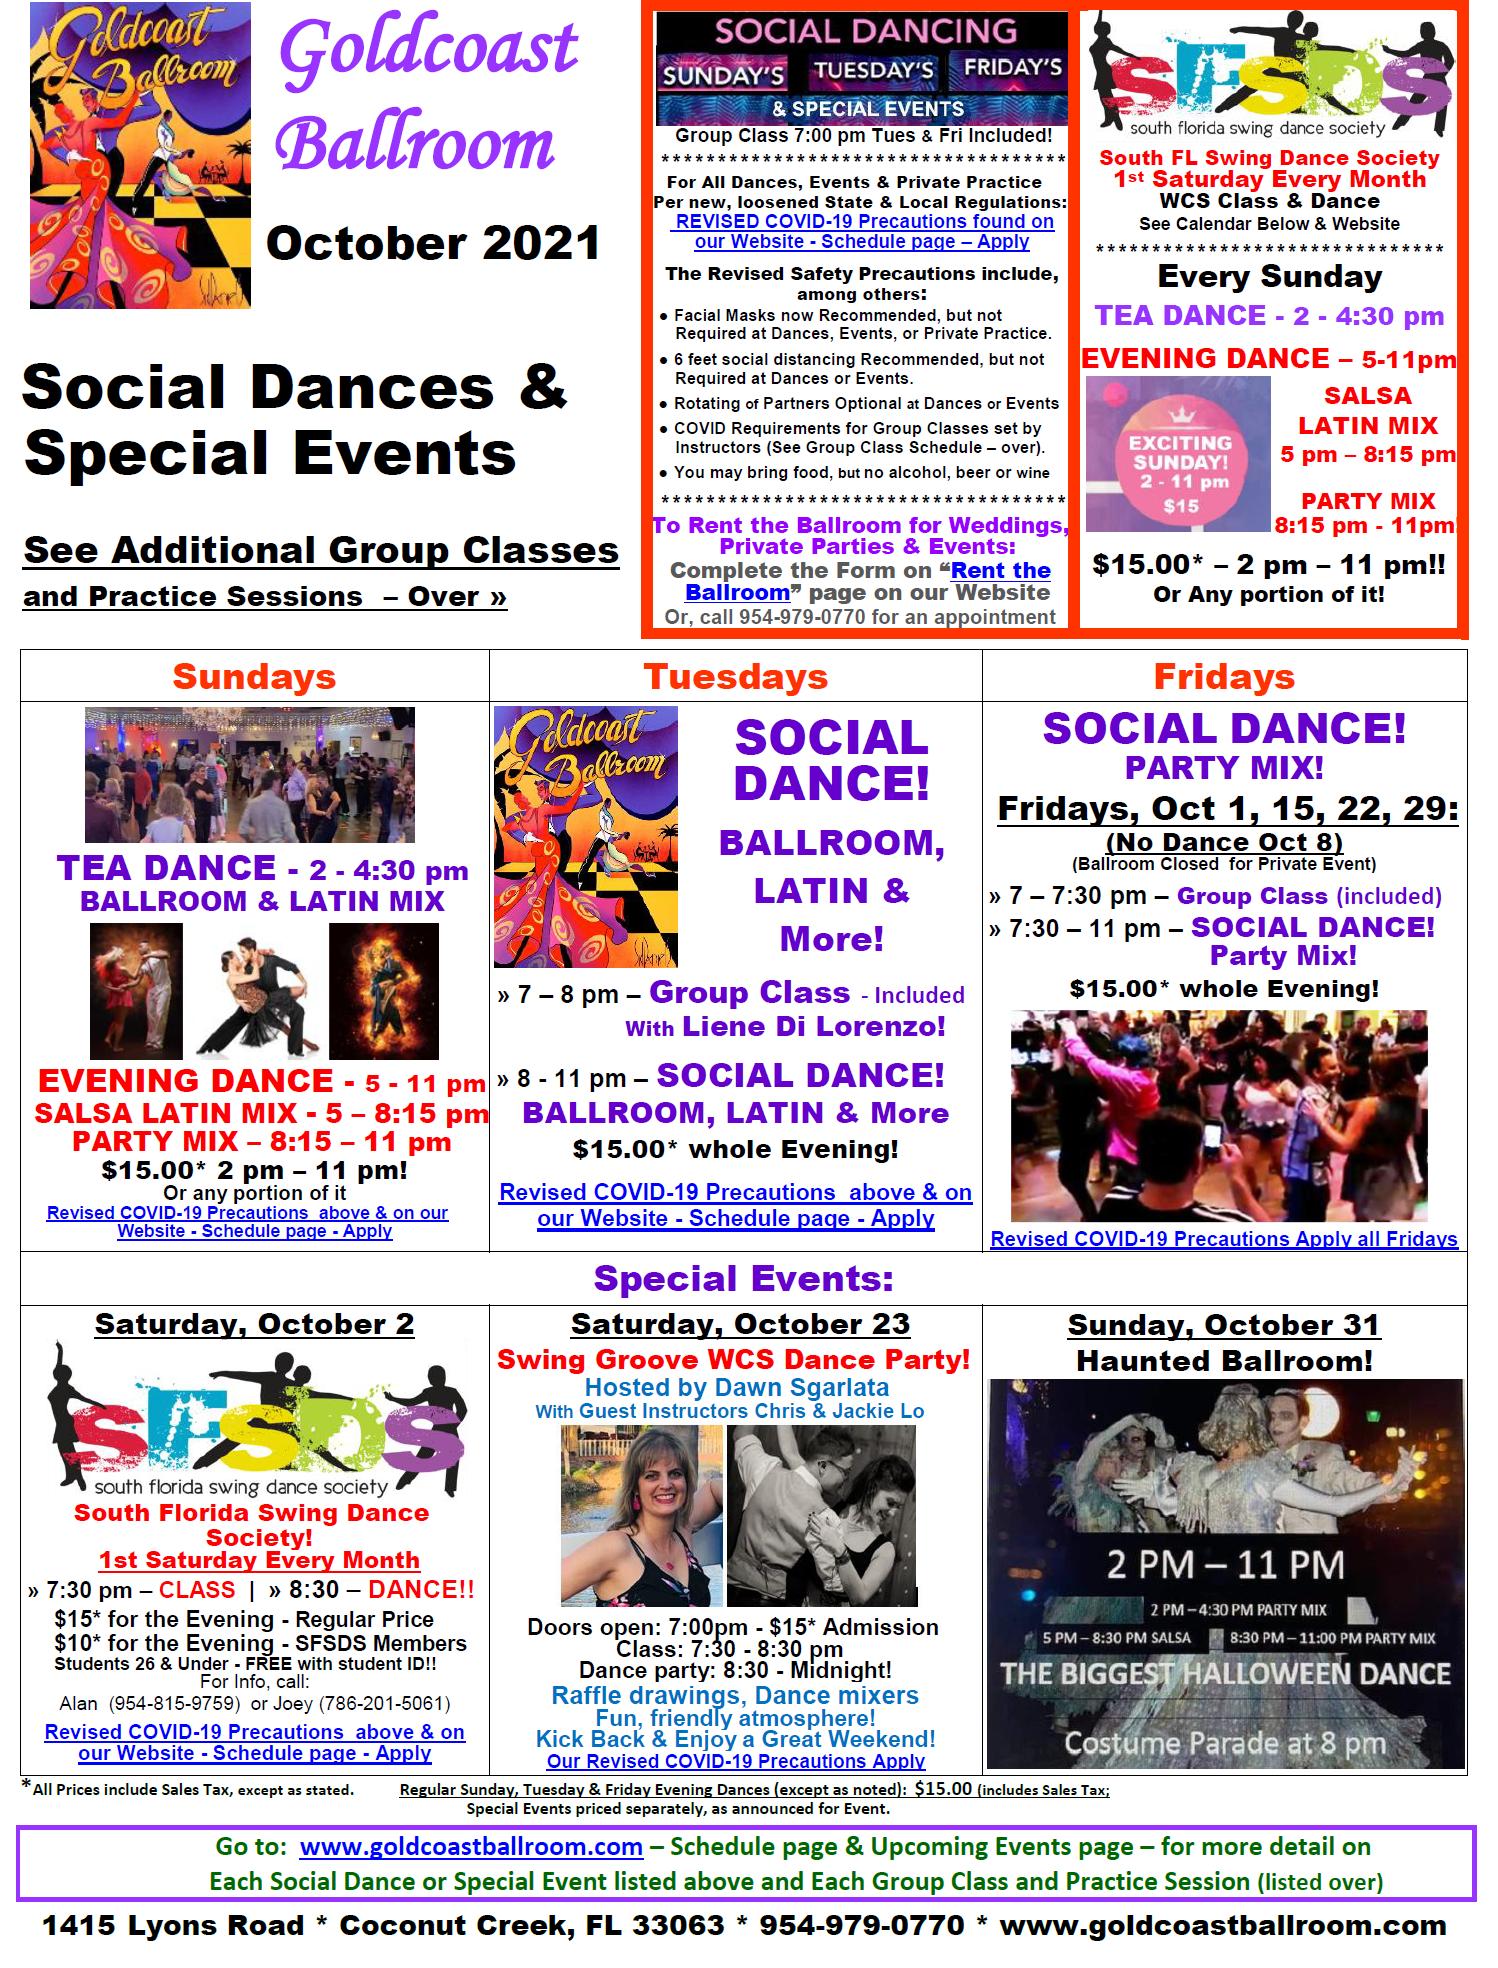 Goldcoast Ballroom October, 2021 Calendar - Social Dances & Special Events - V5